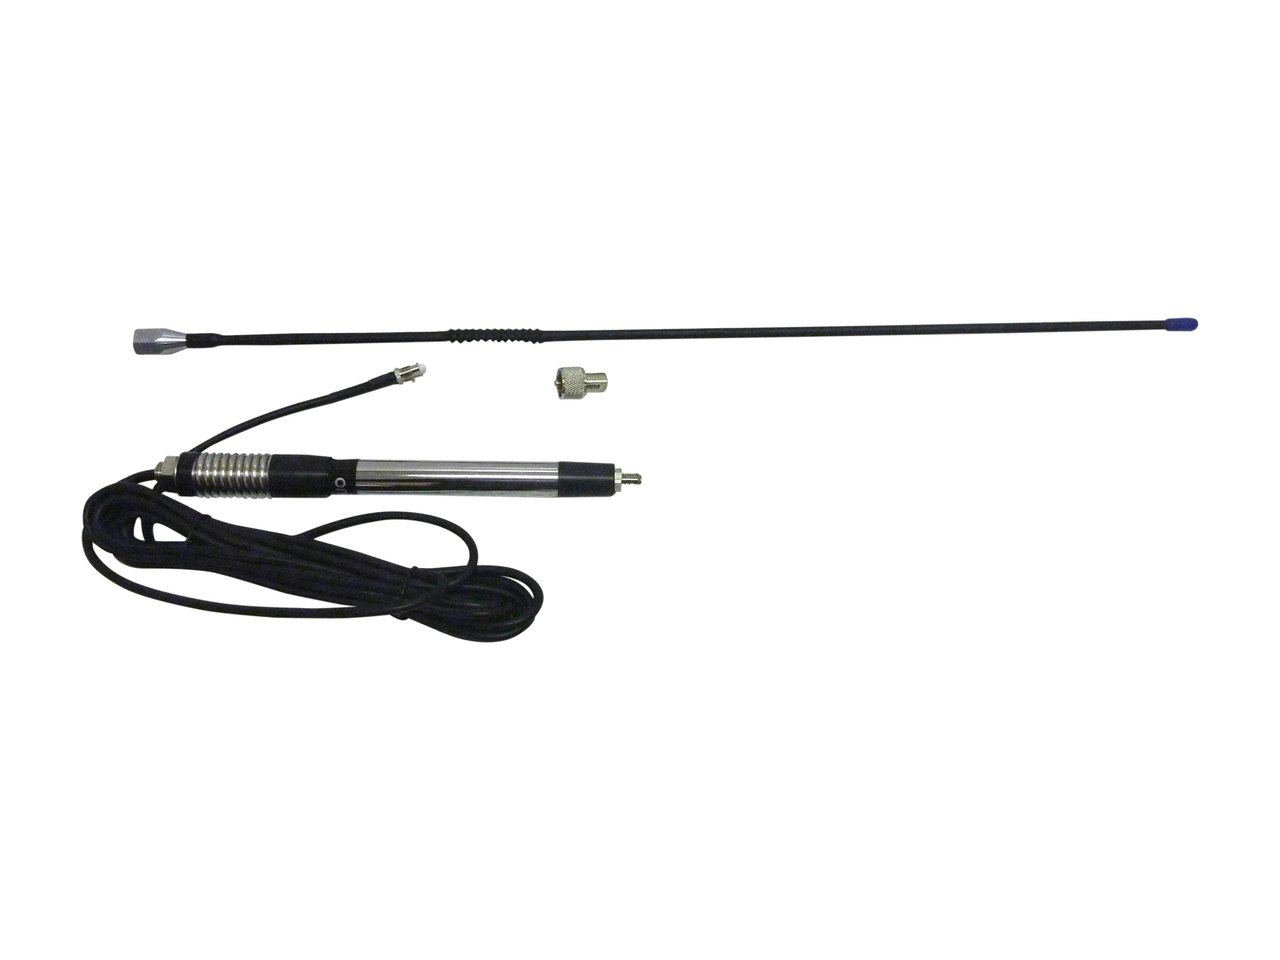 Oricom Uhf Cb Radio Antenna Aerial 6 5dbi